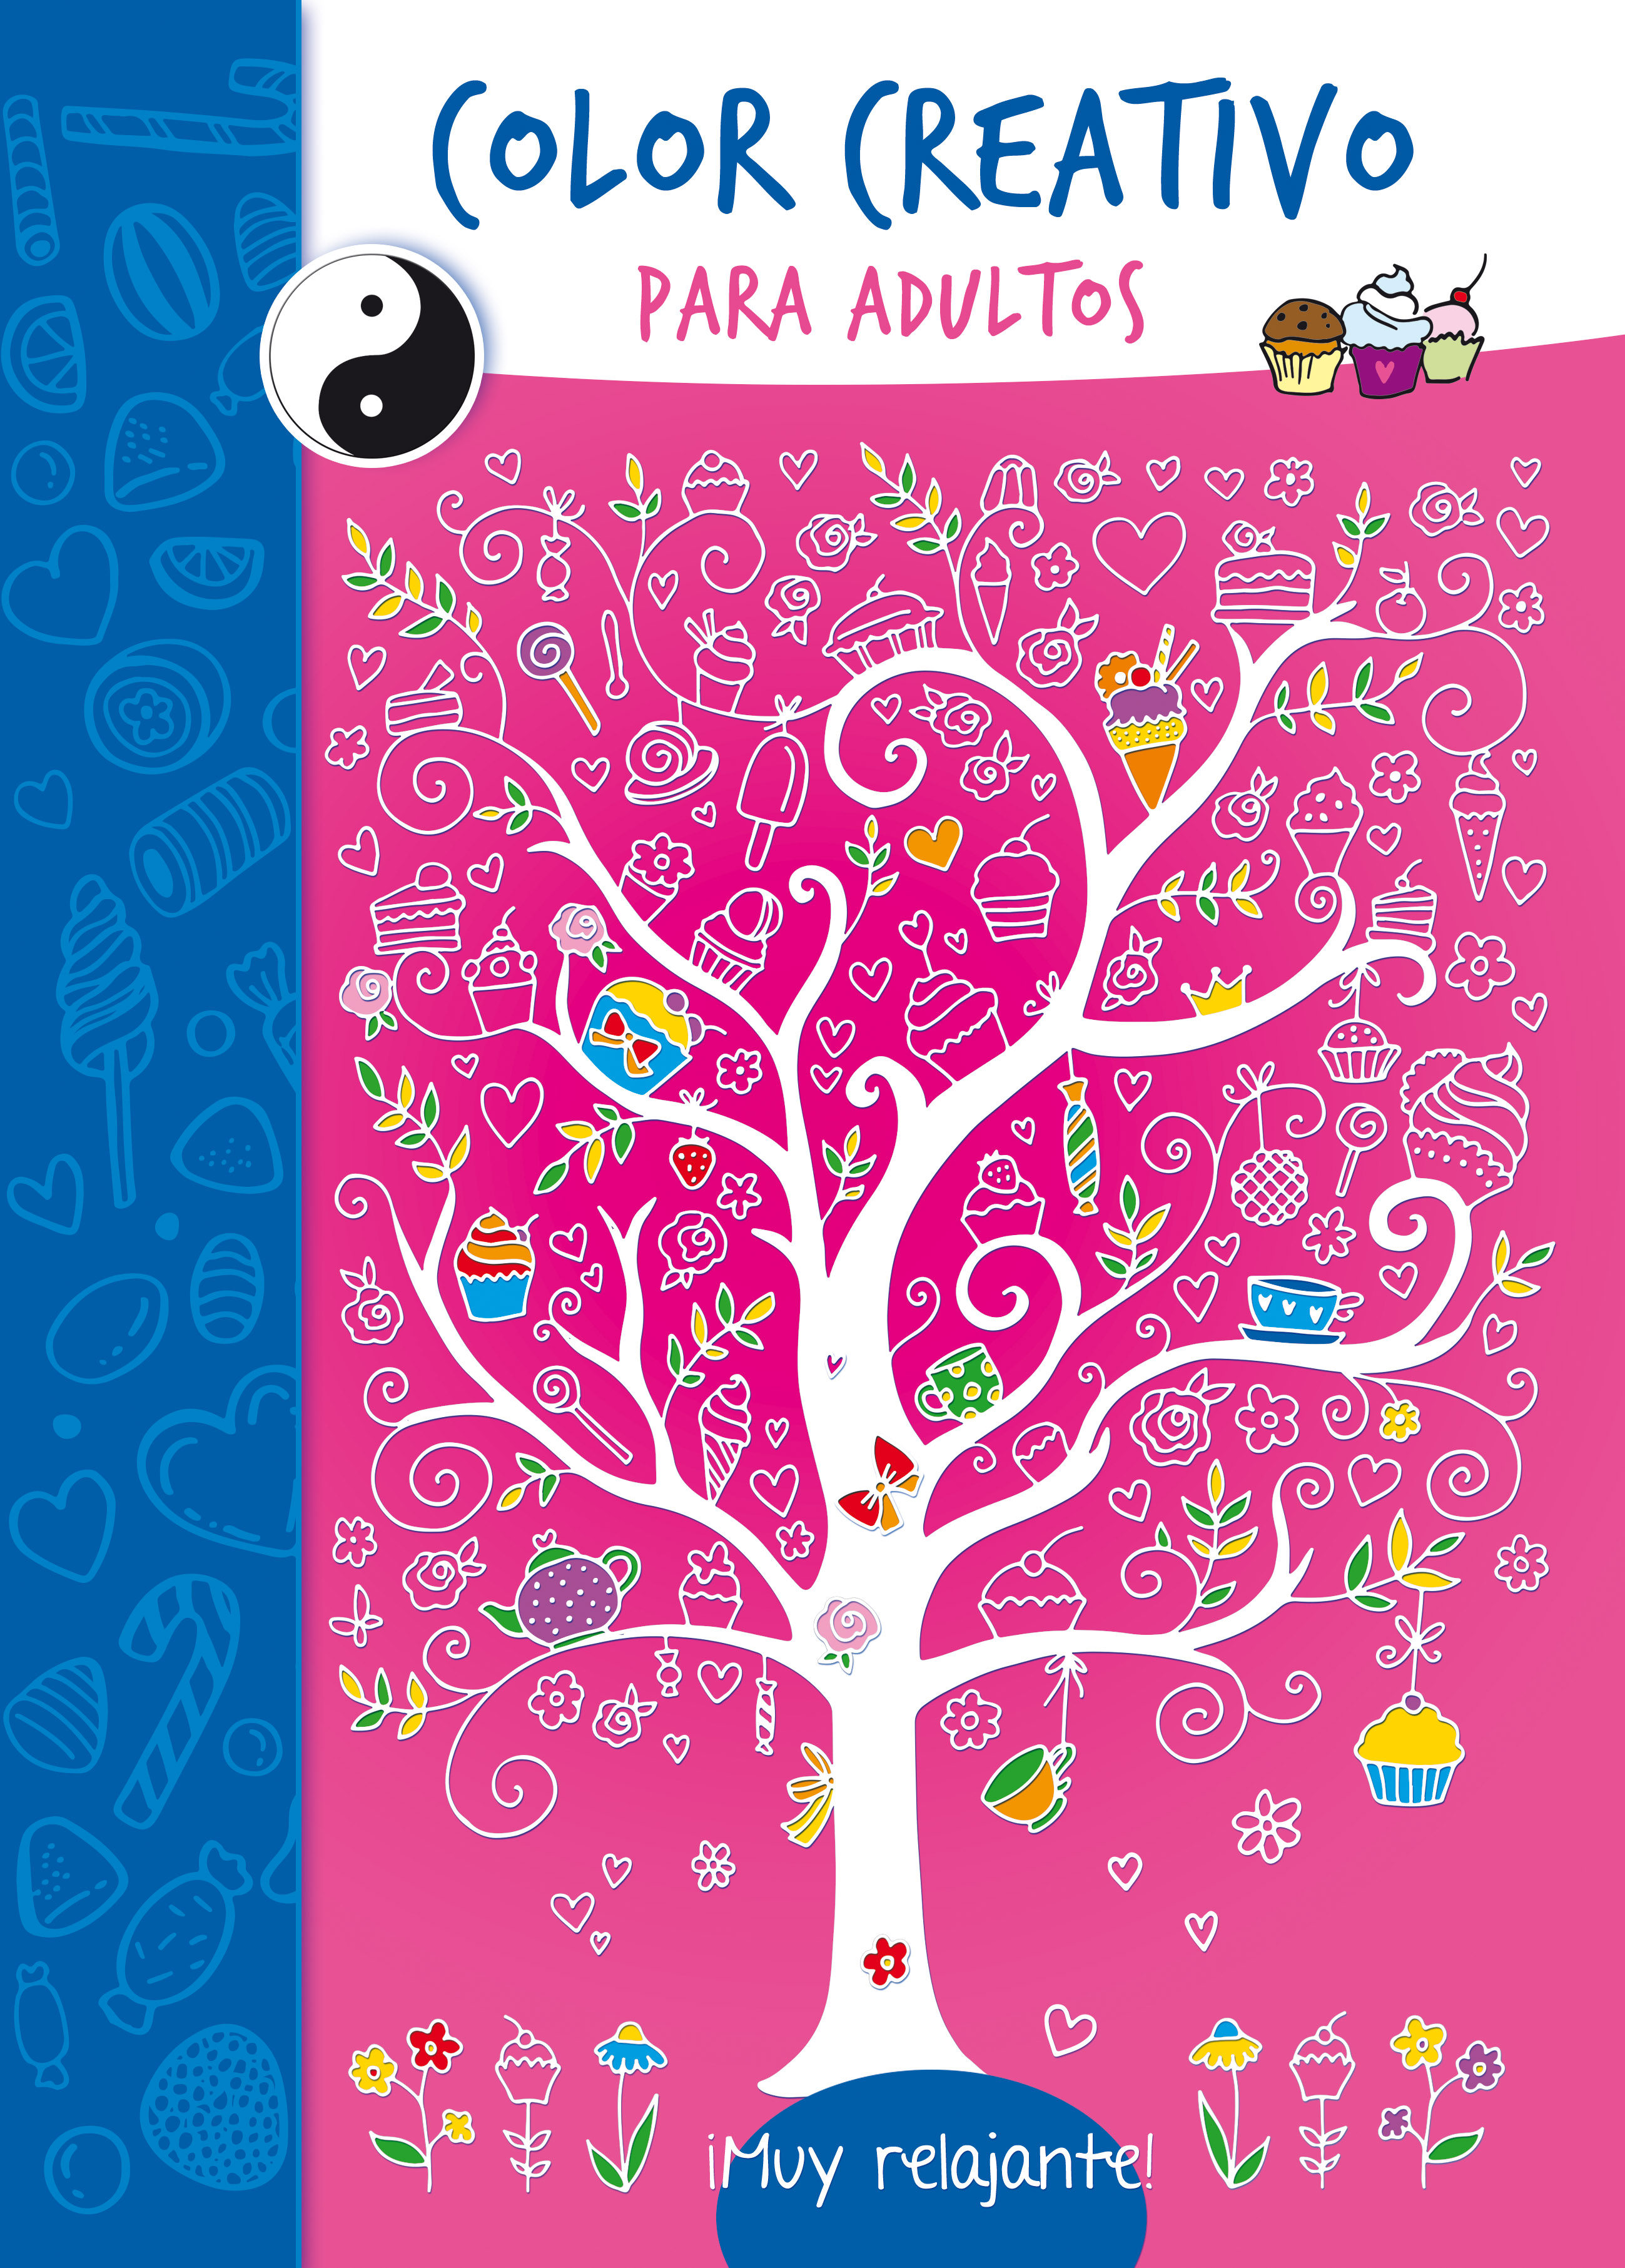 COLOR CREATIVO PARA ADULTOS 2 (ARBOL) | VV.AA. | Comprar libro ...